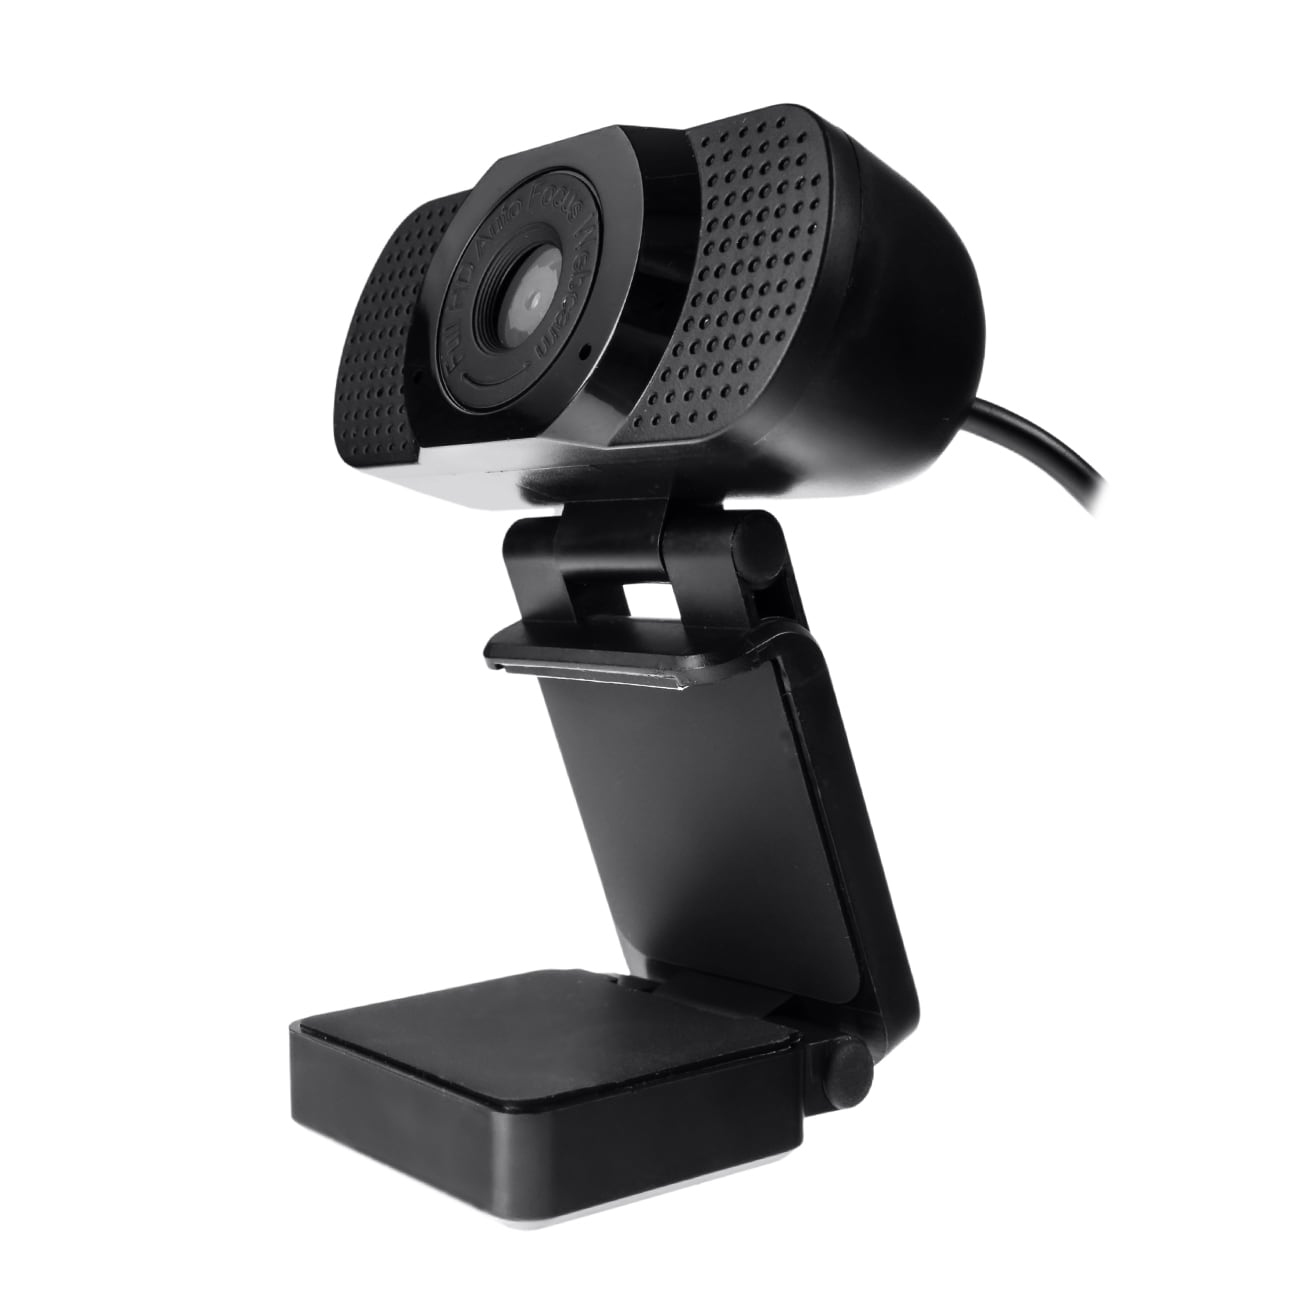 Gaming WebCam For Streaming USB FHD Microphone Camera Auto Focus SP-WCAM11 - 1